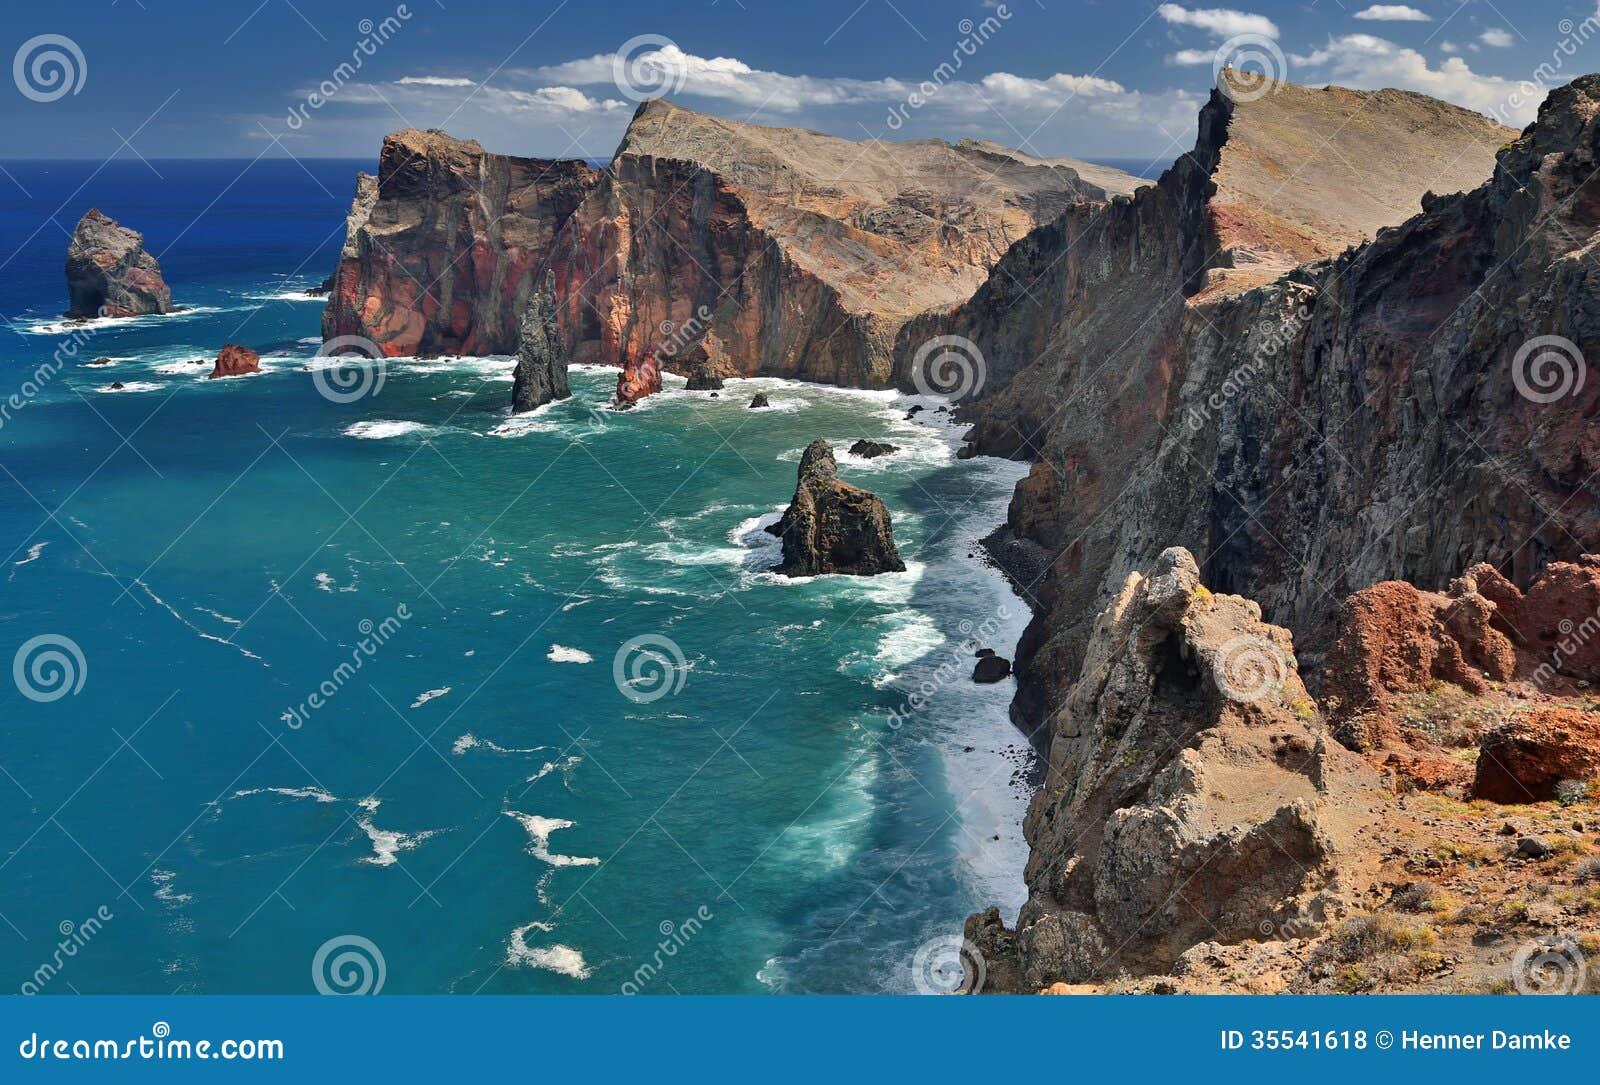 Northern coastline of Ponta de Sao Lourenco at Madeira, Portugal - HDR ...